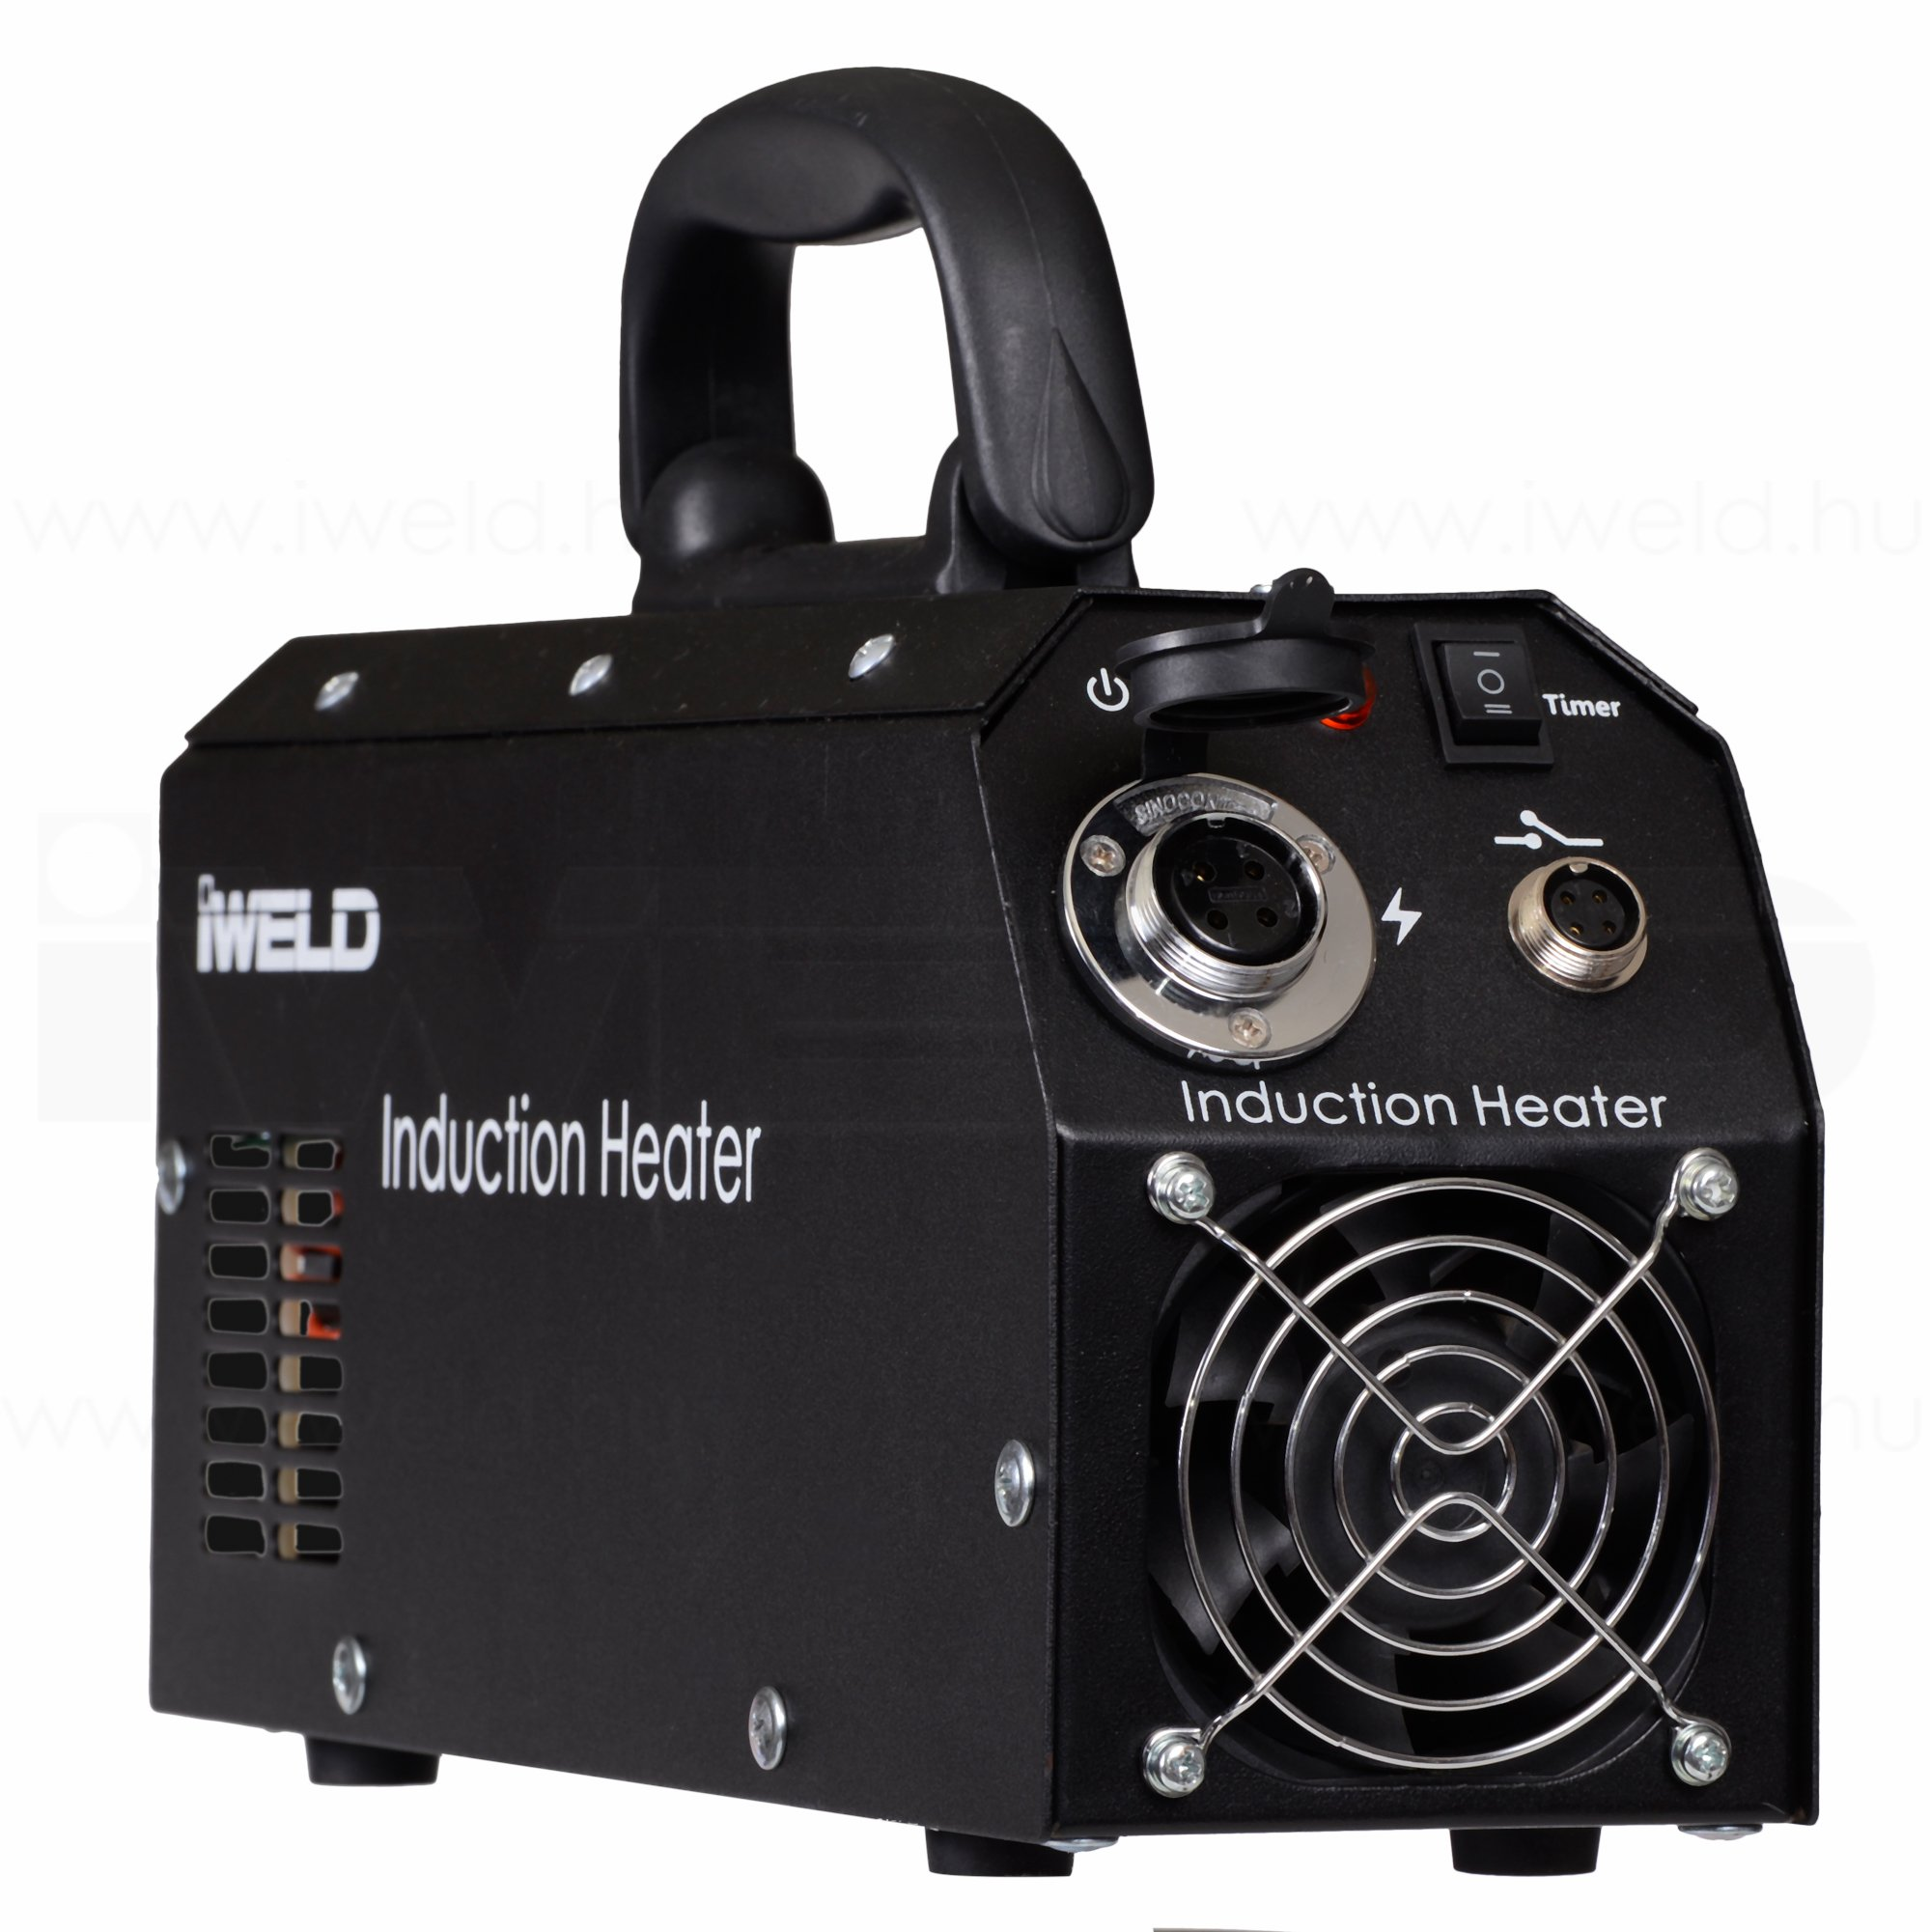 Incalzitor prin inductie 100 kHz